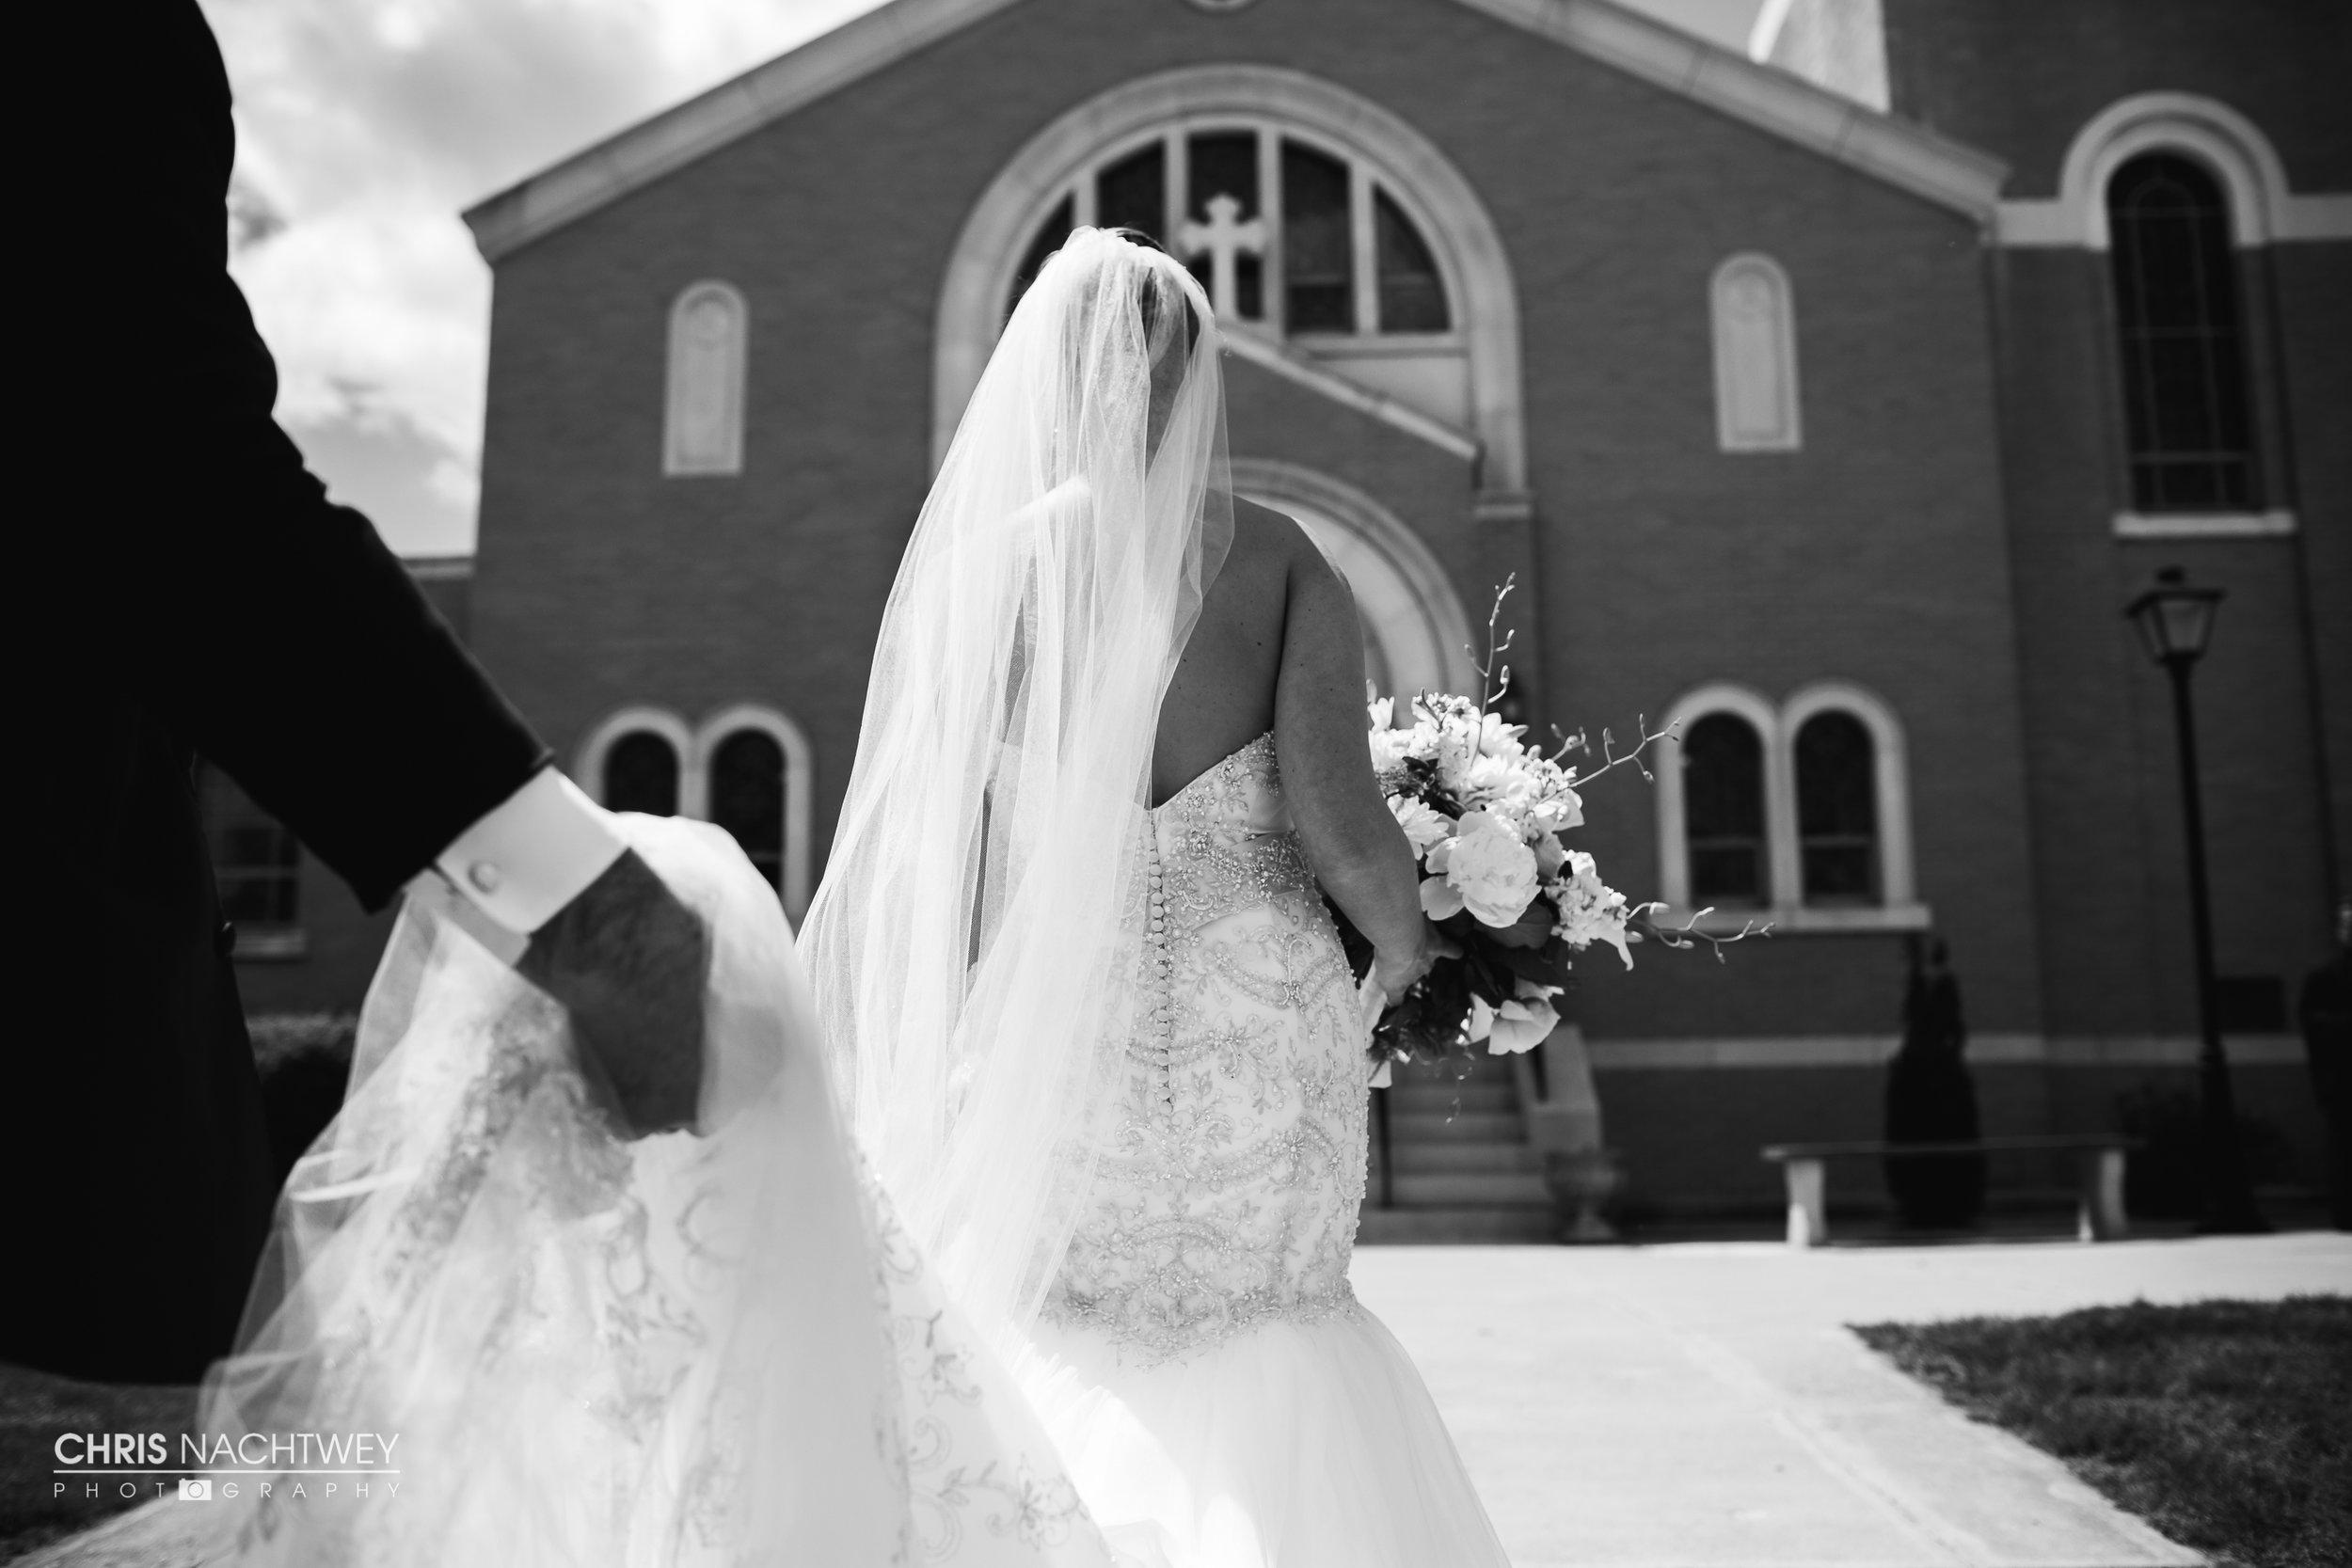 mystic-artistic-wedding-photographer-chris-nachtwey-2017-9.jpg